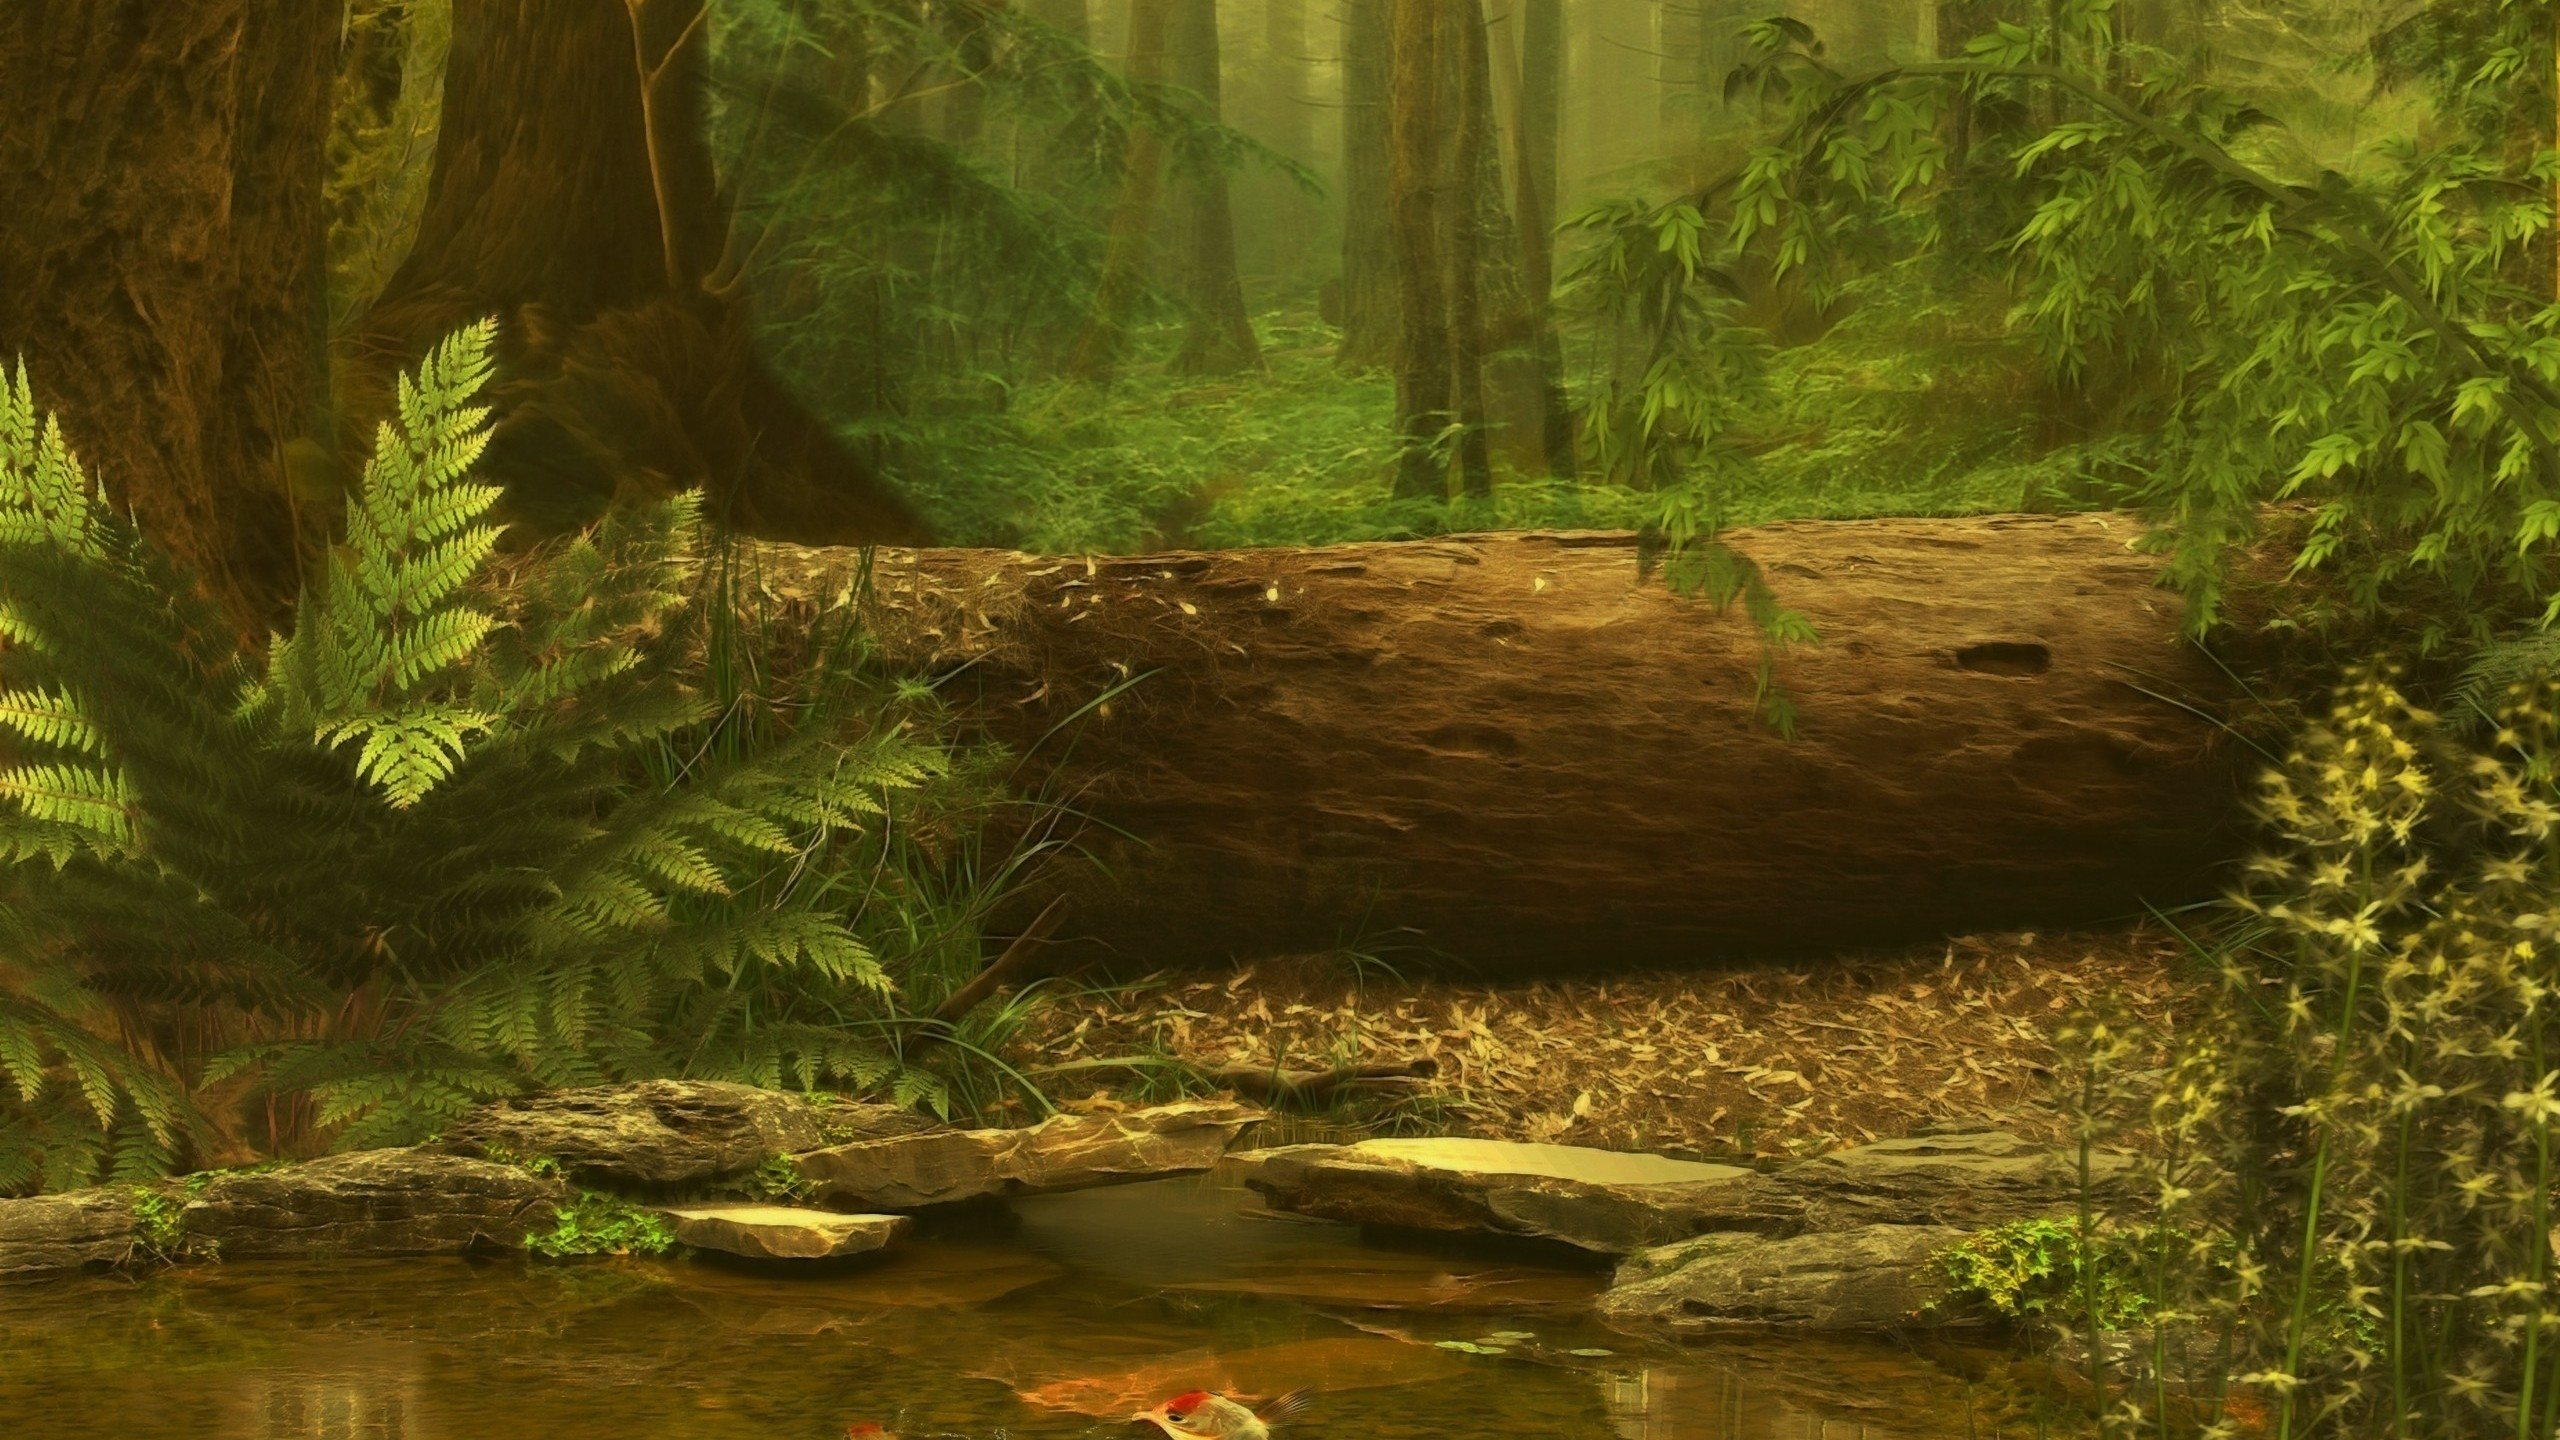 Forest Scene Wallpaper Wallpapersafari